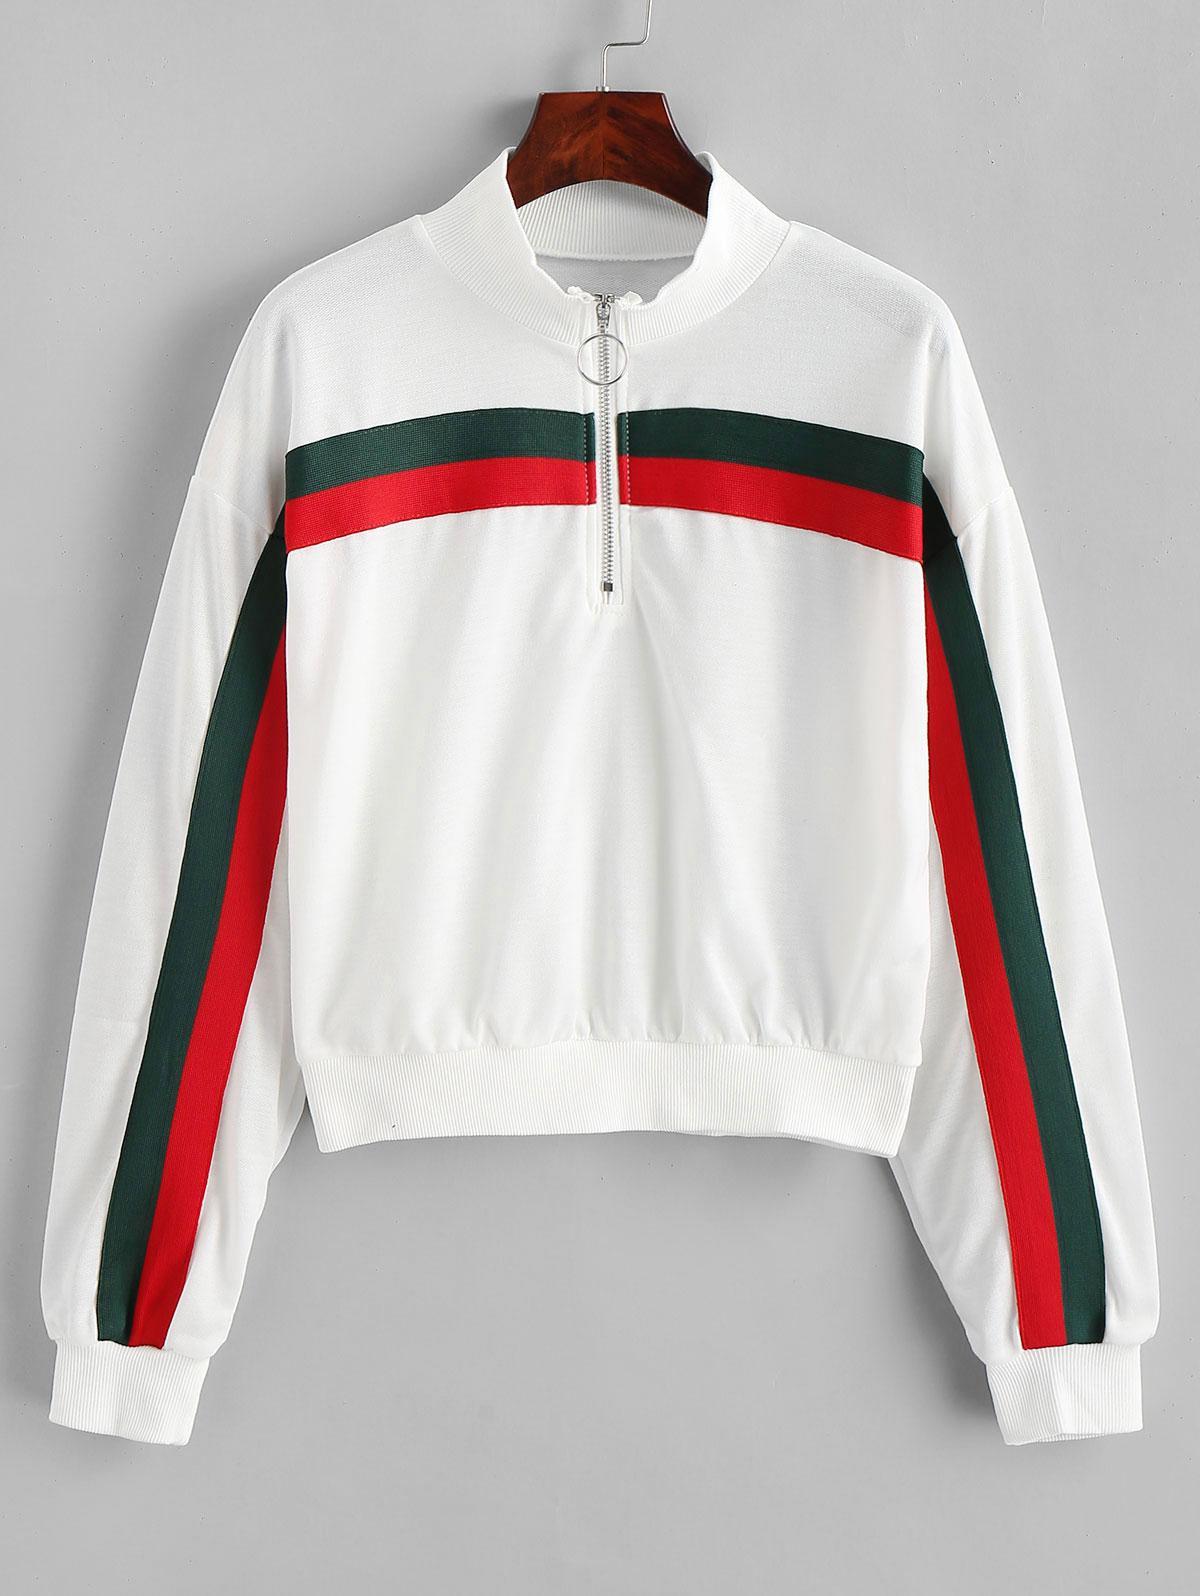 Pull Ring Zipper Striped Drop Shoulder Sweatshirt фото